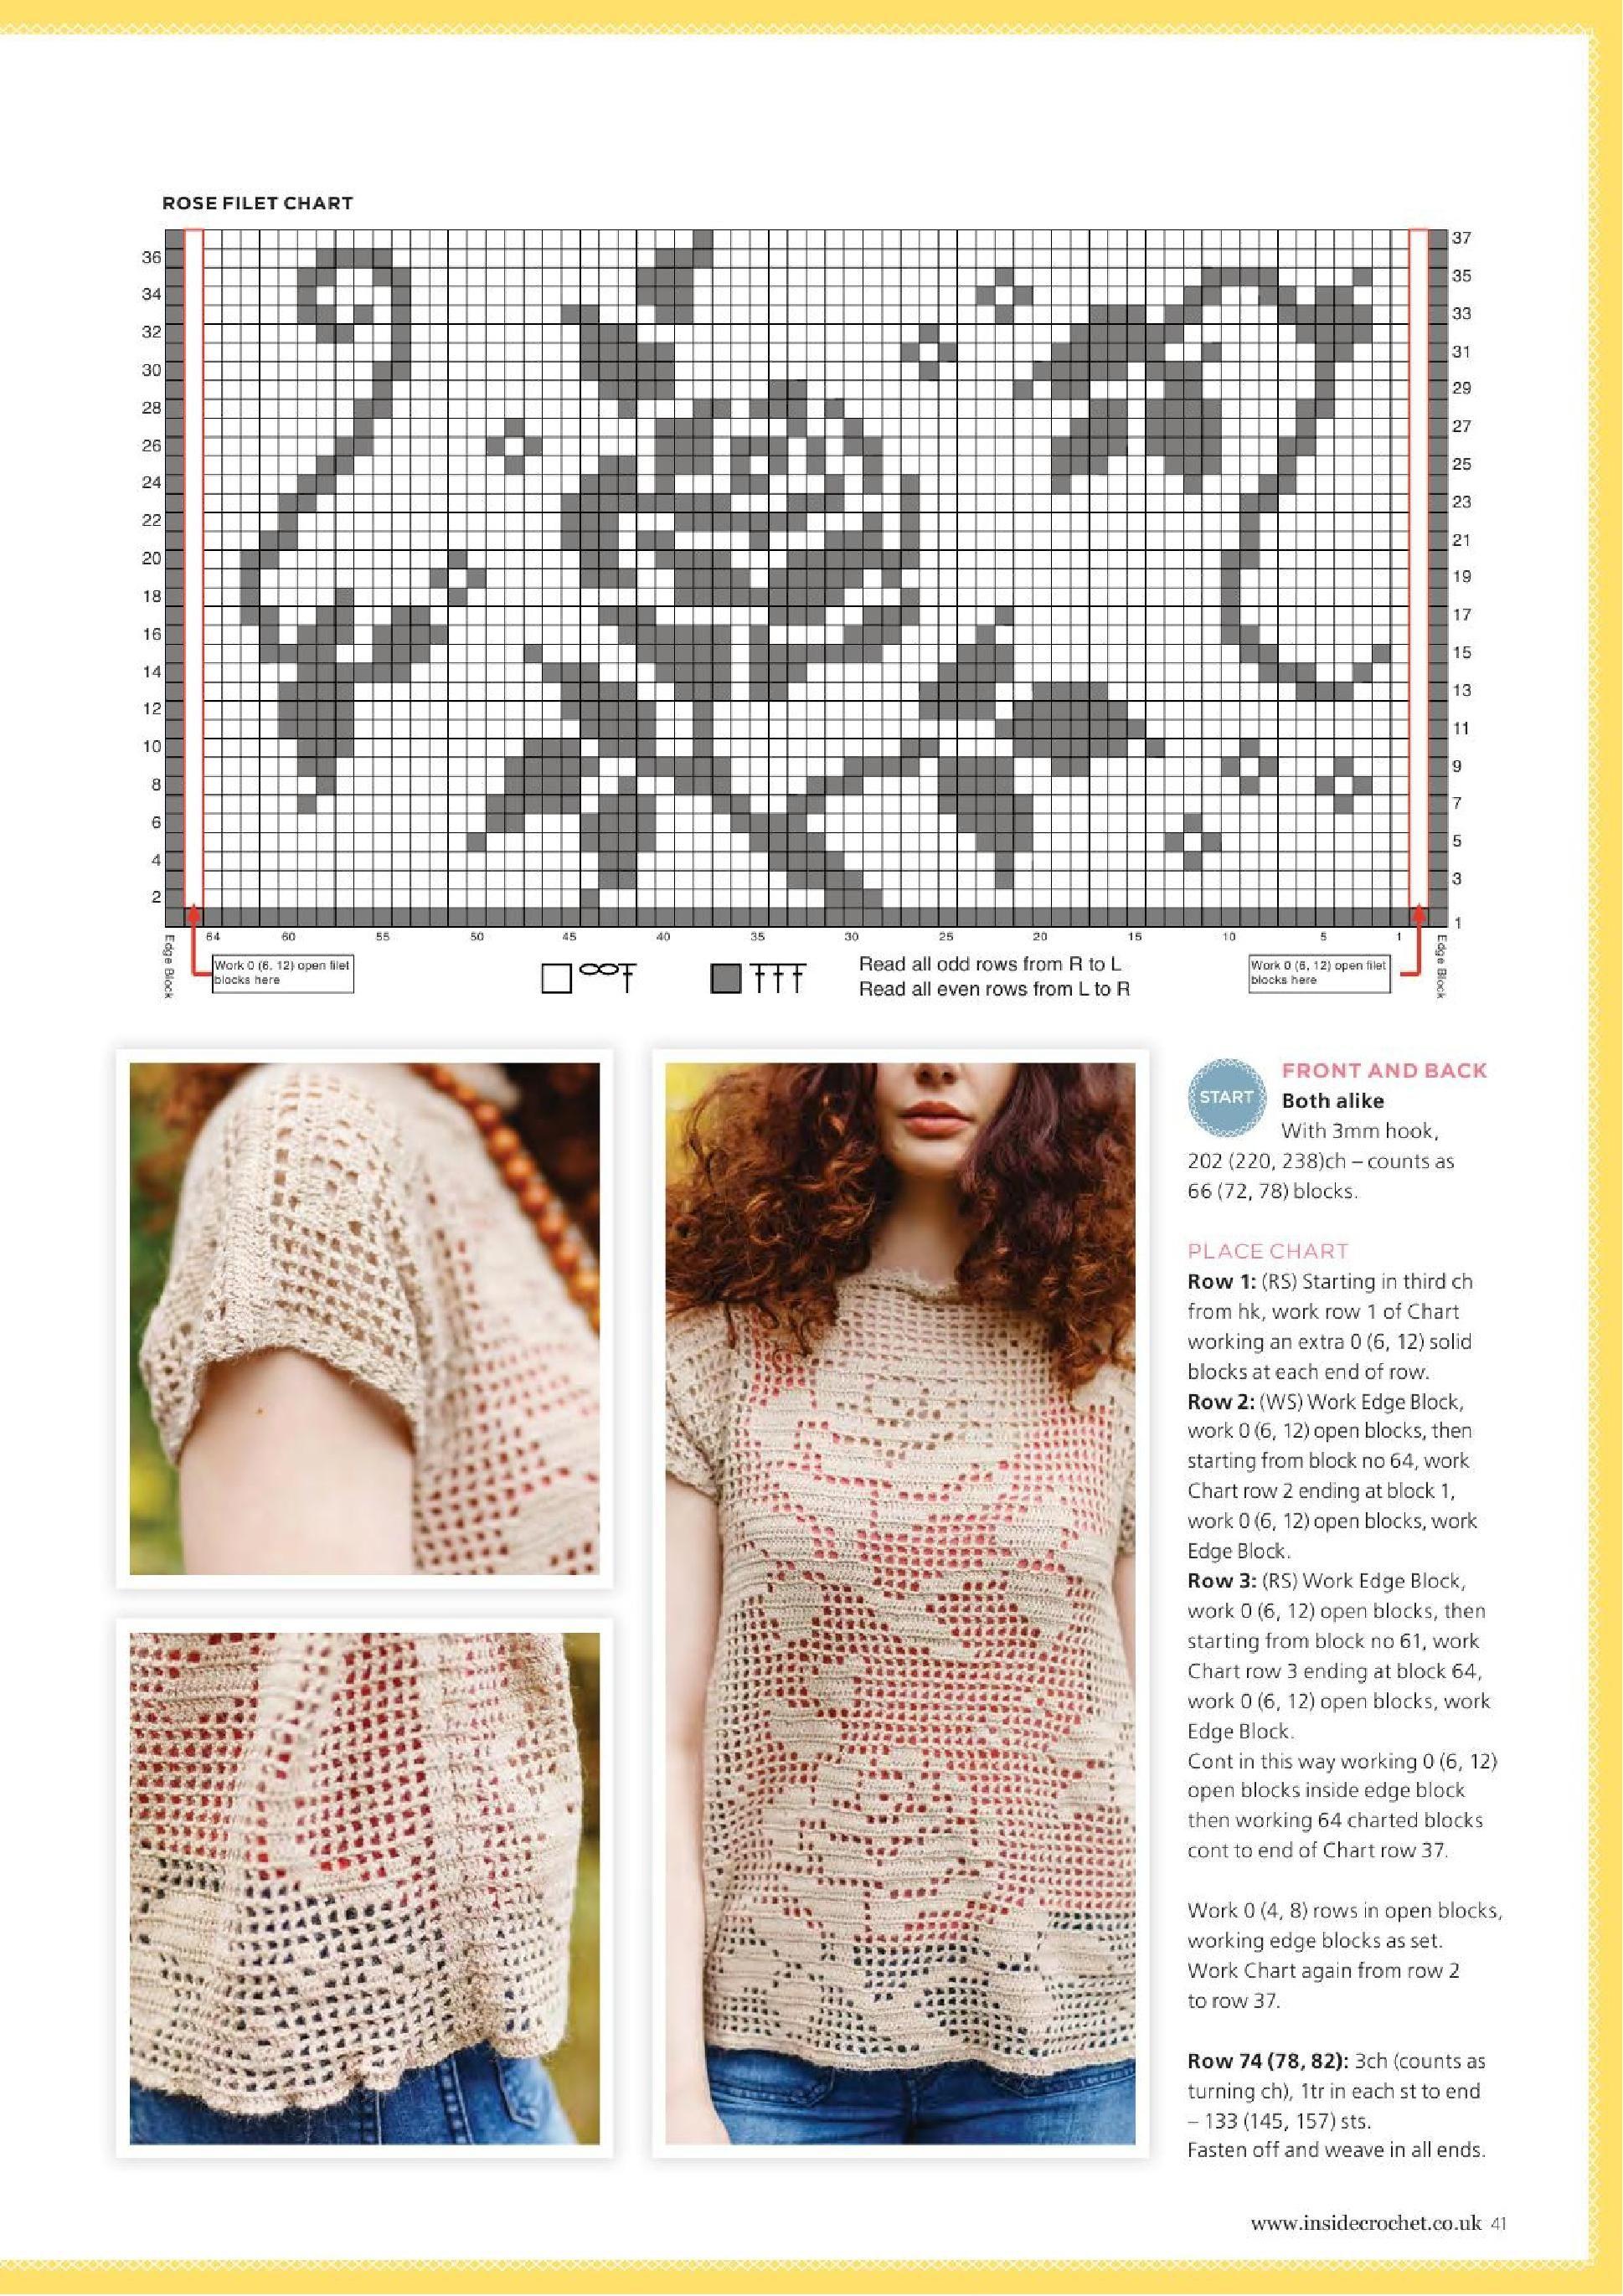 ◇◇◇ Page_00041.jpg | Cool Beans | Pinterest | Túnicas, Blusas y ...